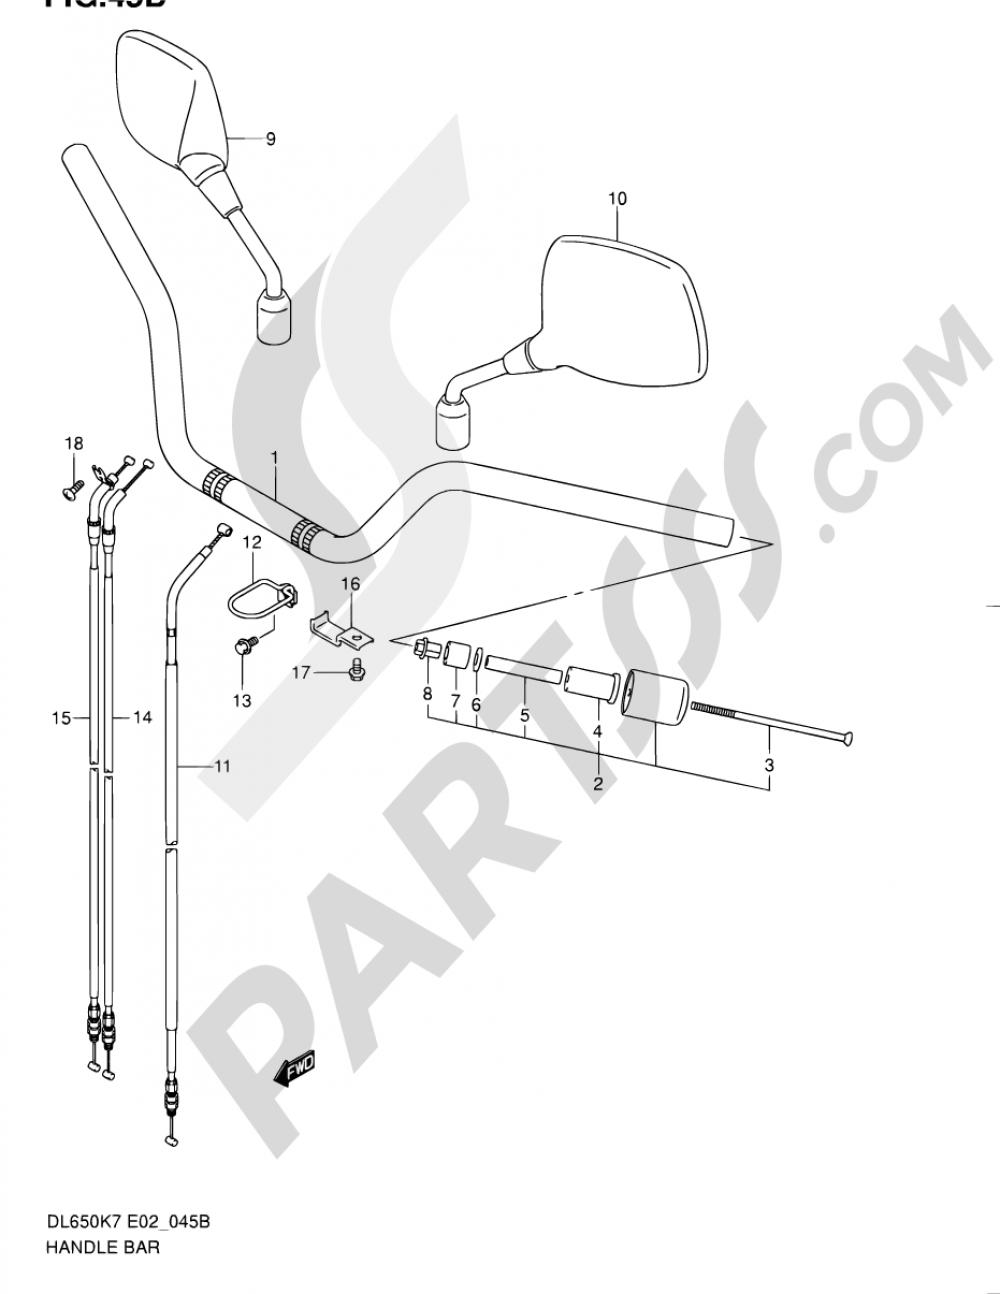 45B - HANDLEBAR (MODEL K9 P37/MODEL L0) Suzuki VSTROM DL650 2010